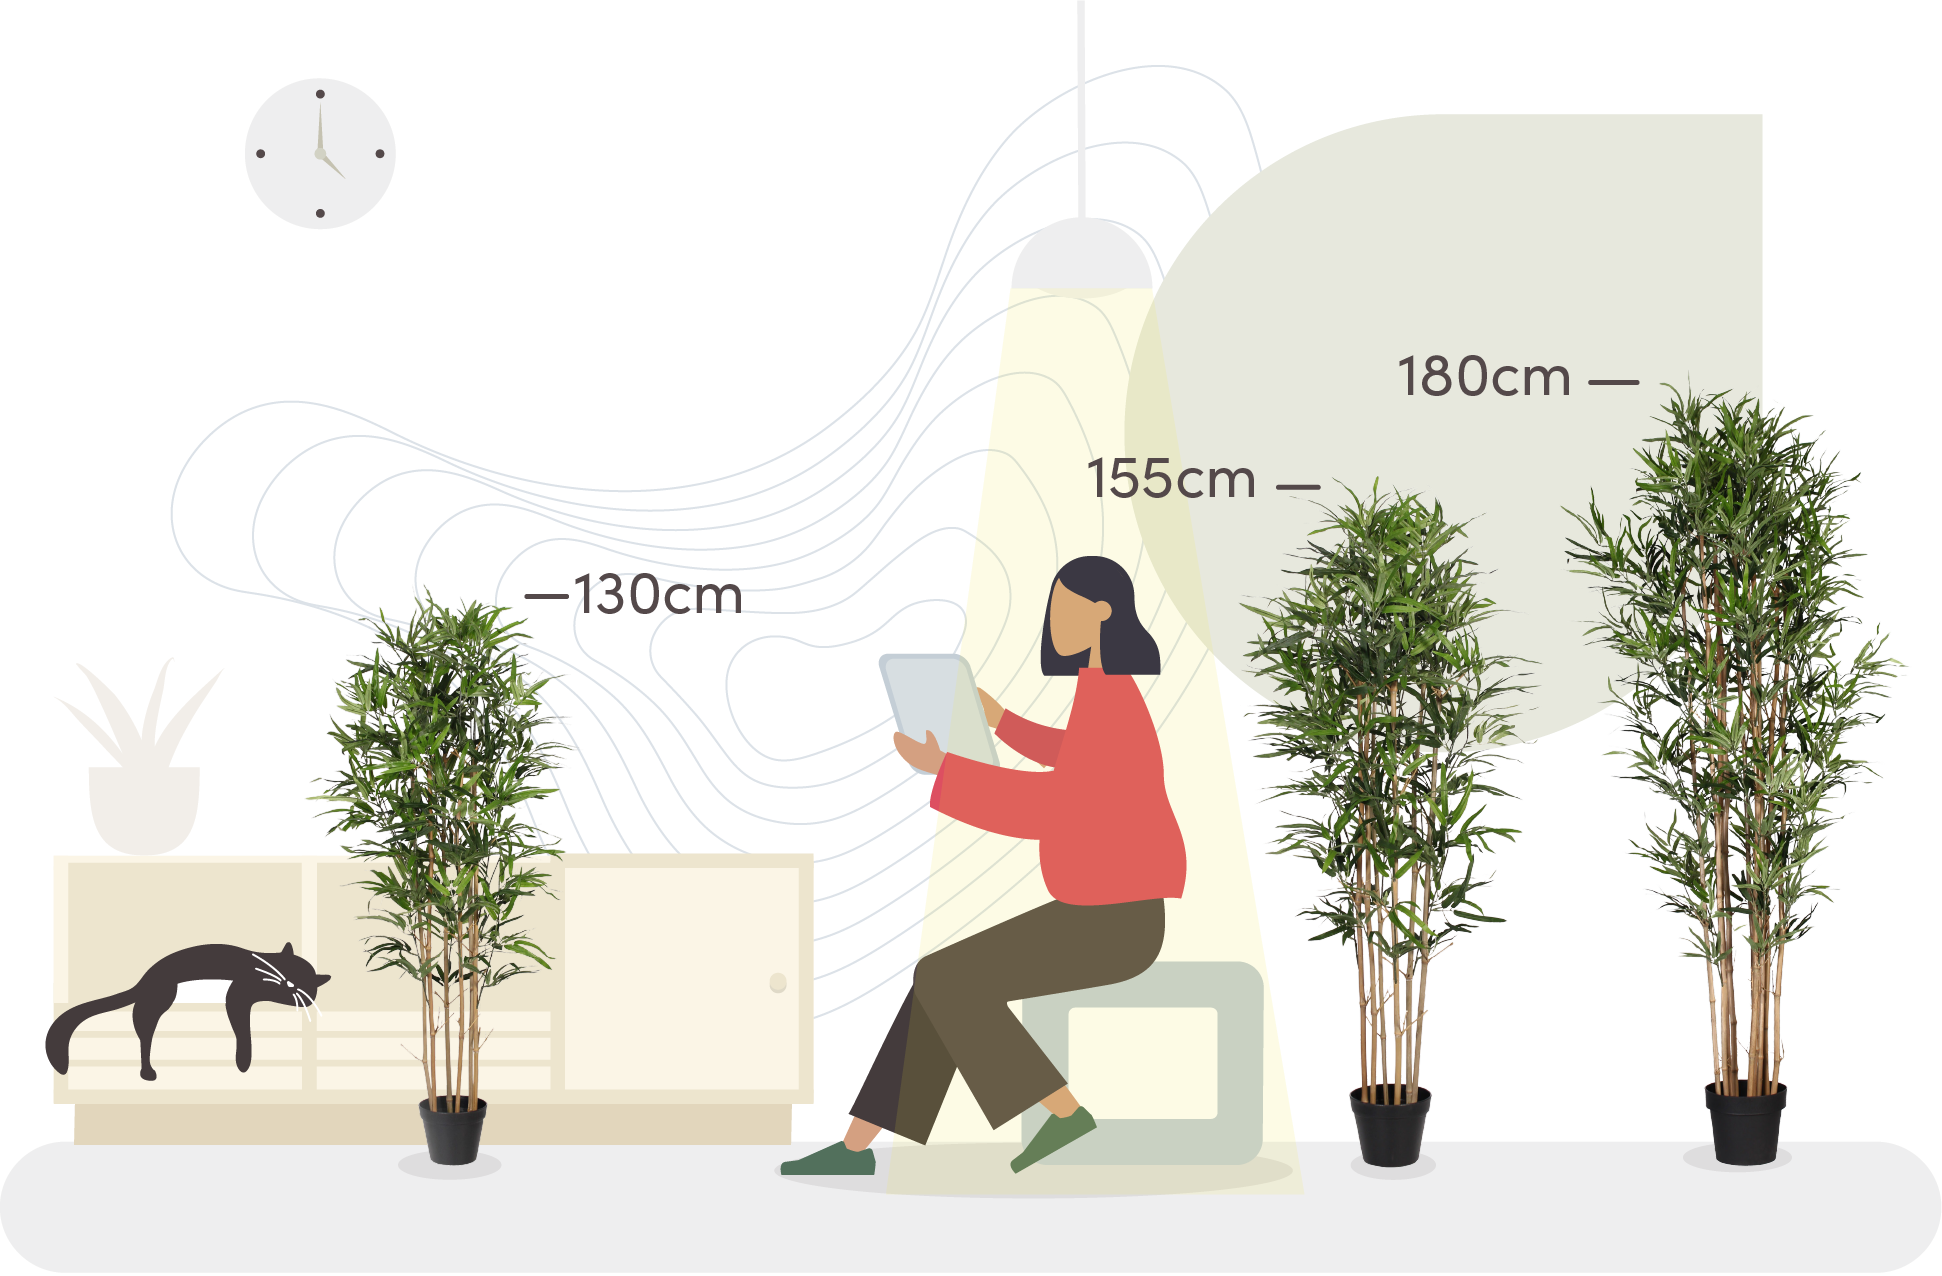 Oriental bamboo tree size comaparison